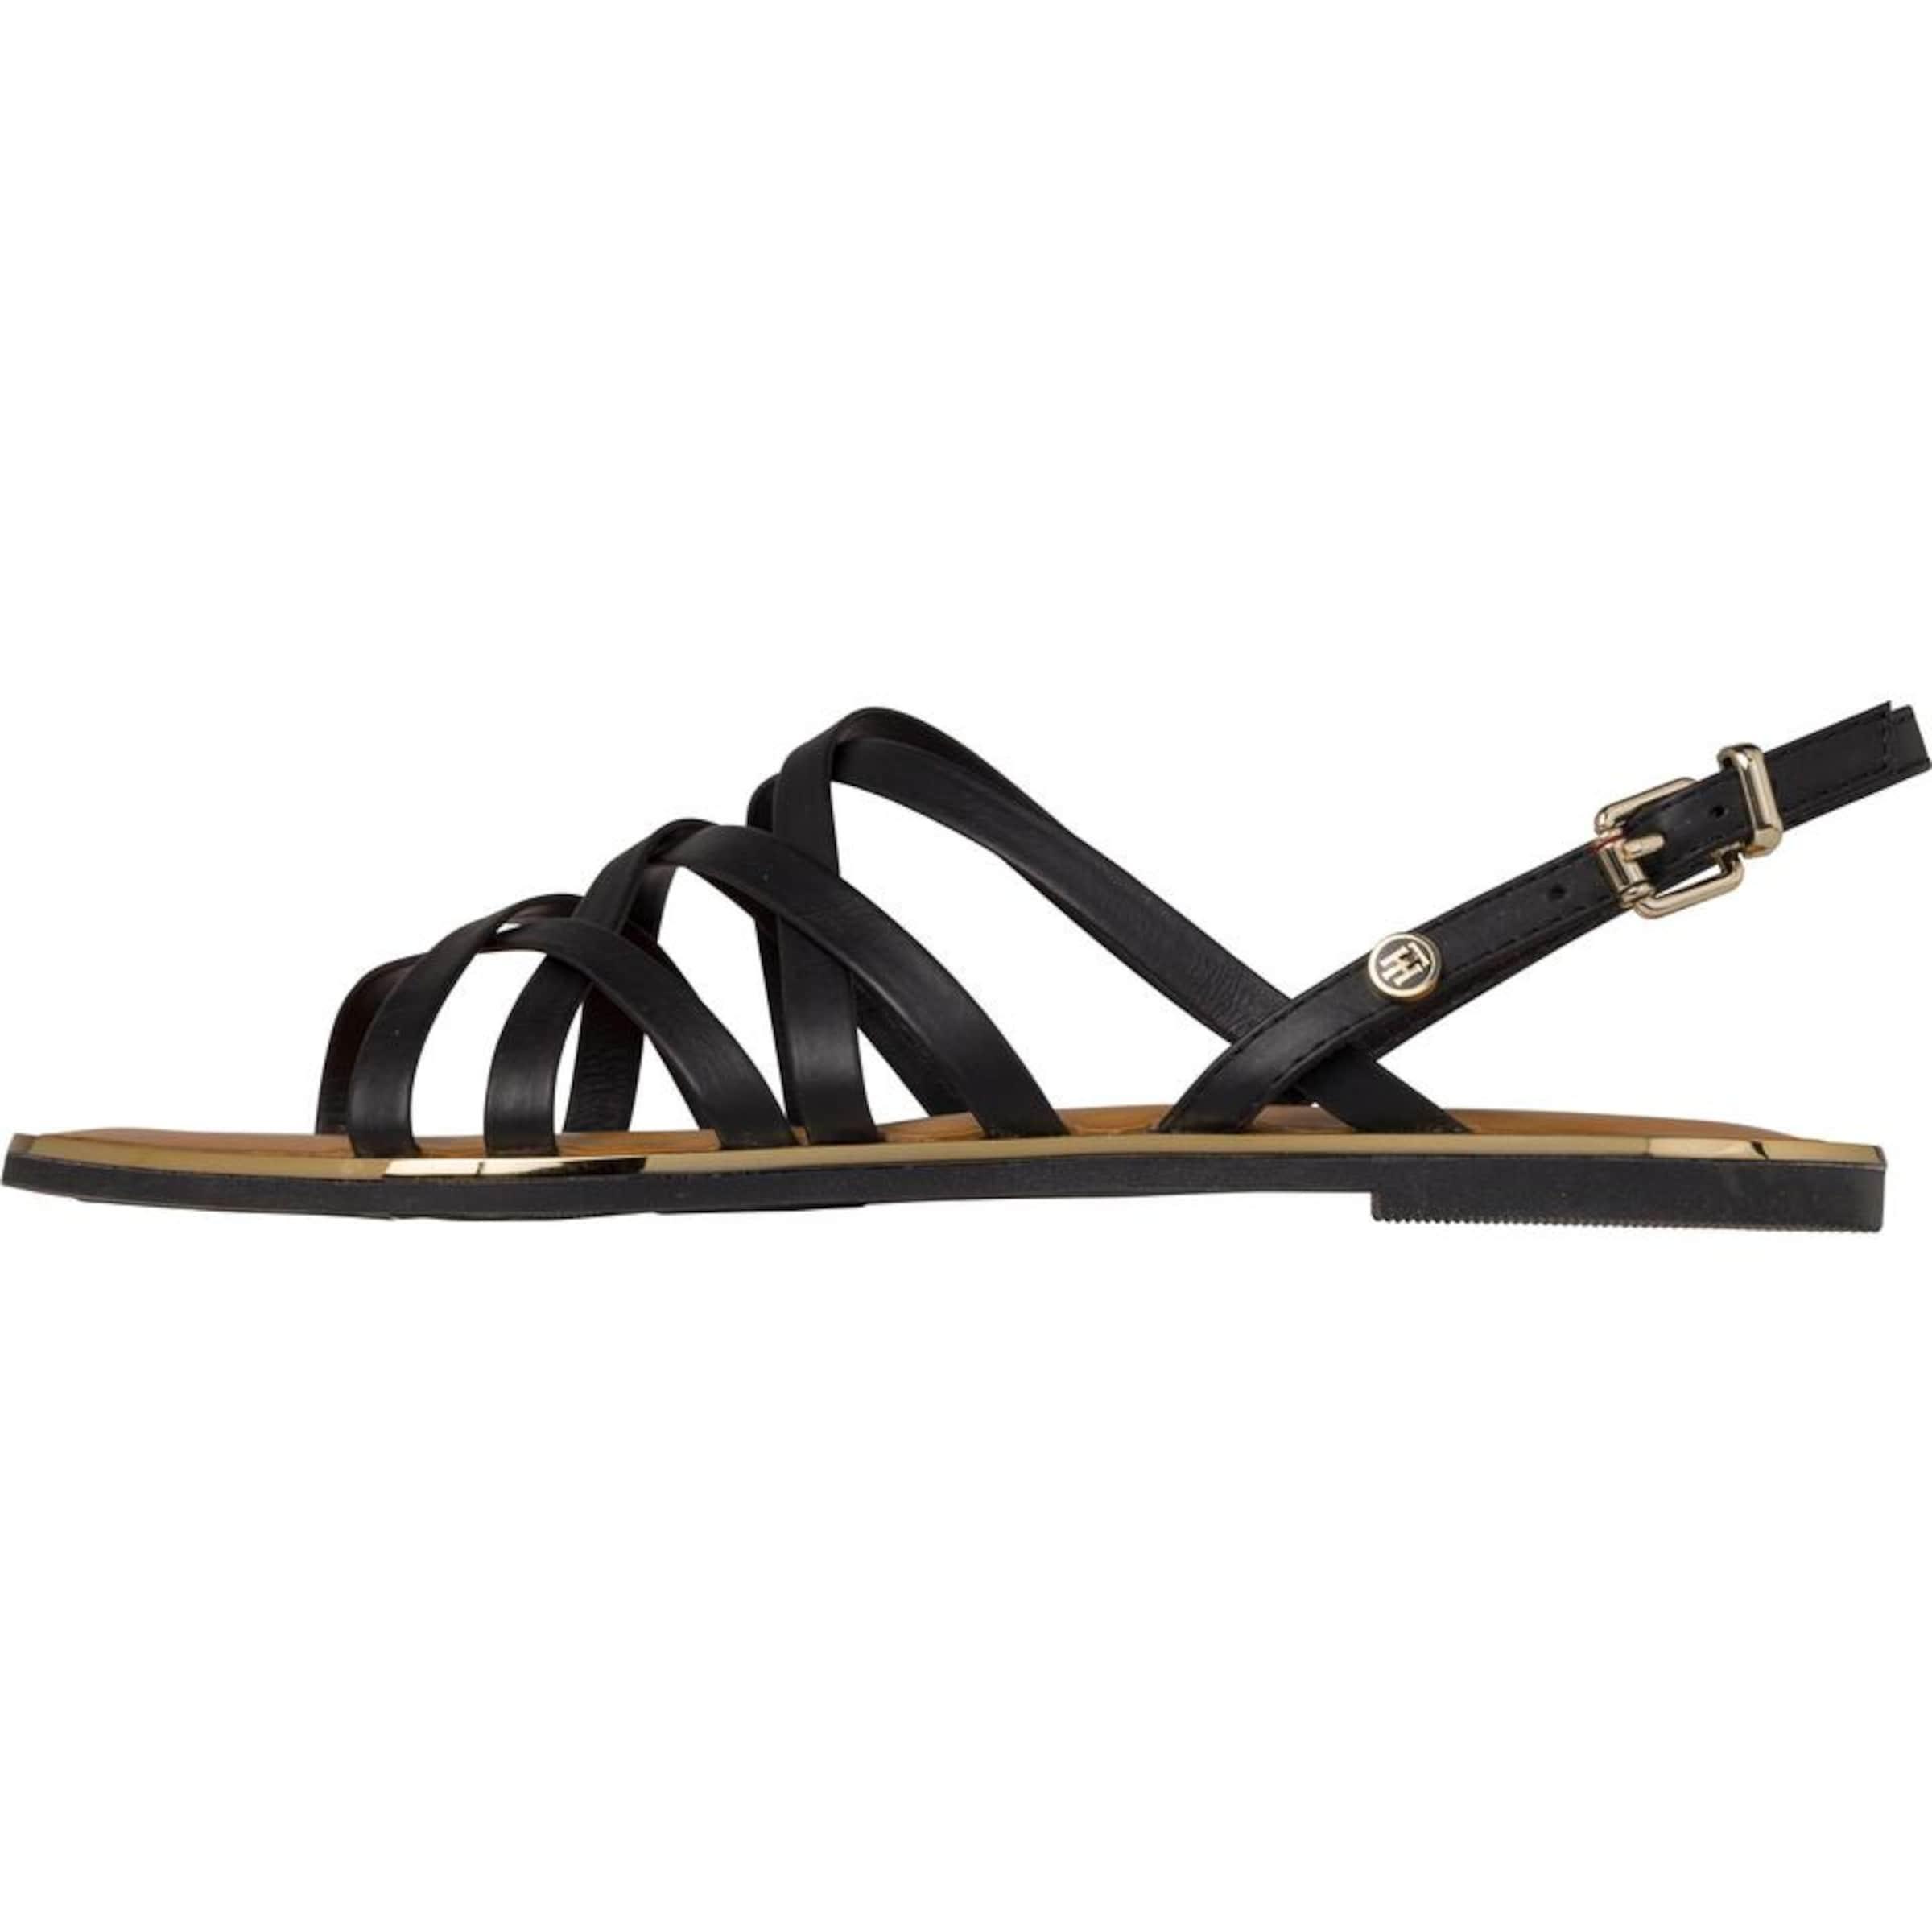 TOMMY HILFIGER   Sandalen 'LEATHER STRAPPY FLAT SANDAL' Schuhe Gut getragene Schuhe